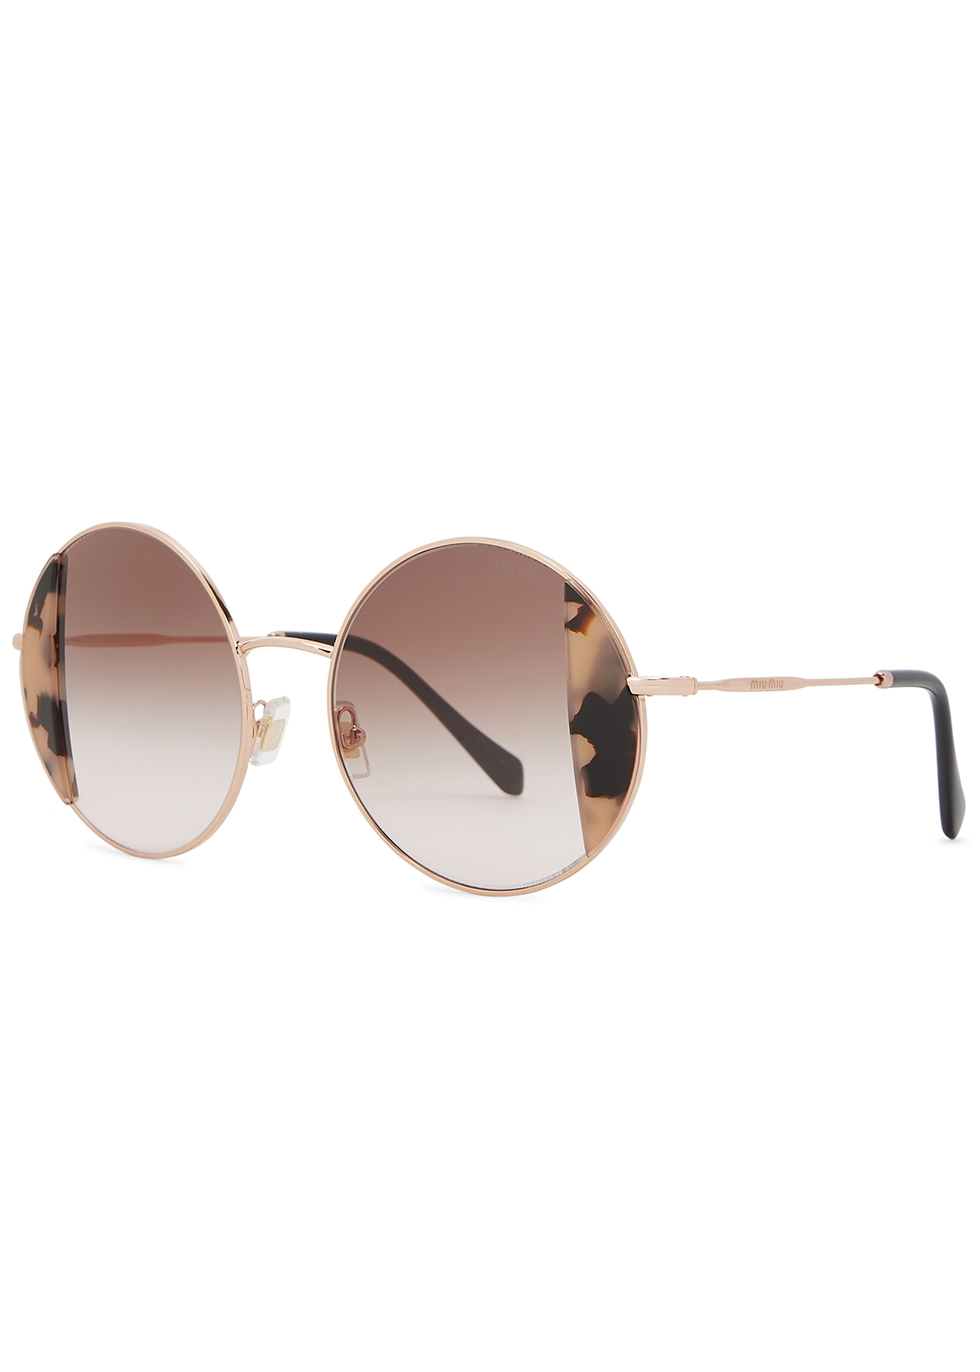 Noir gold-tone round-frame sunglasses